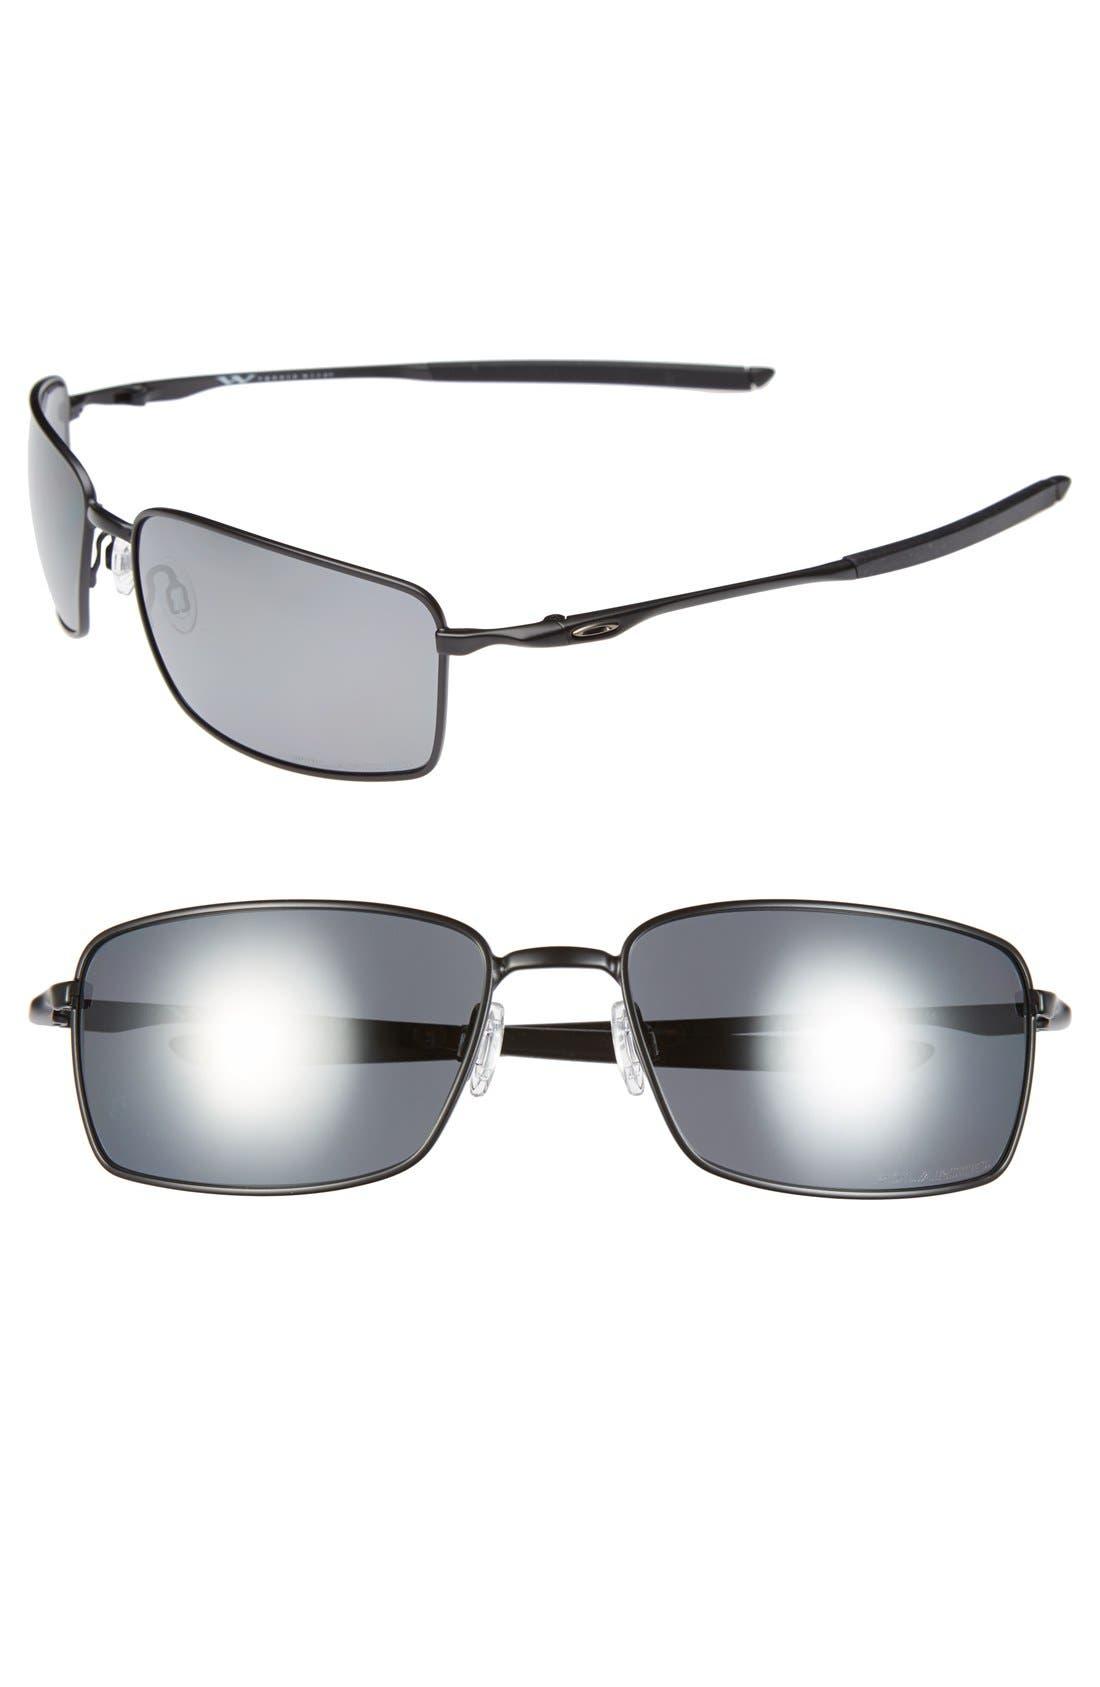 60mm Polarized Sunglasses,                         Main,                         color, 001